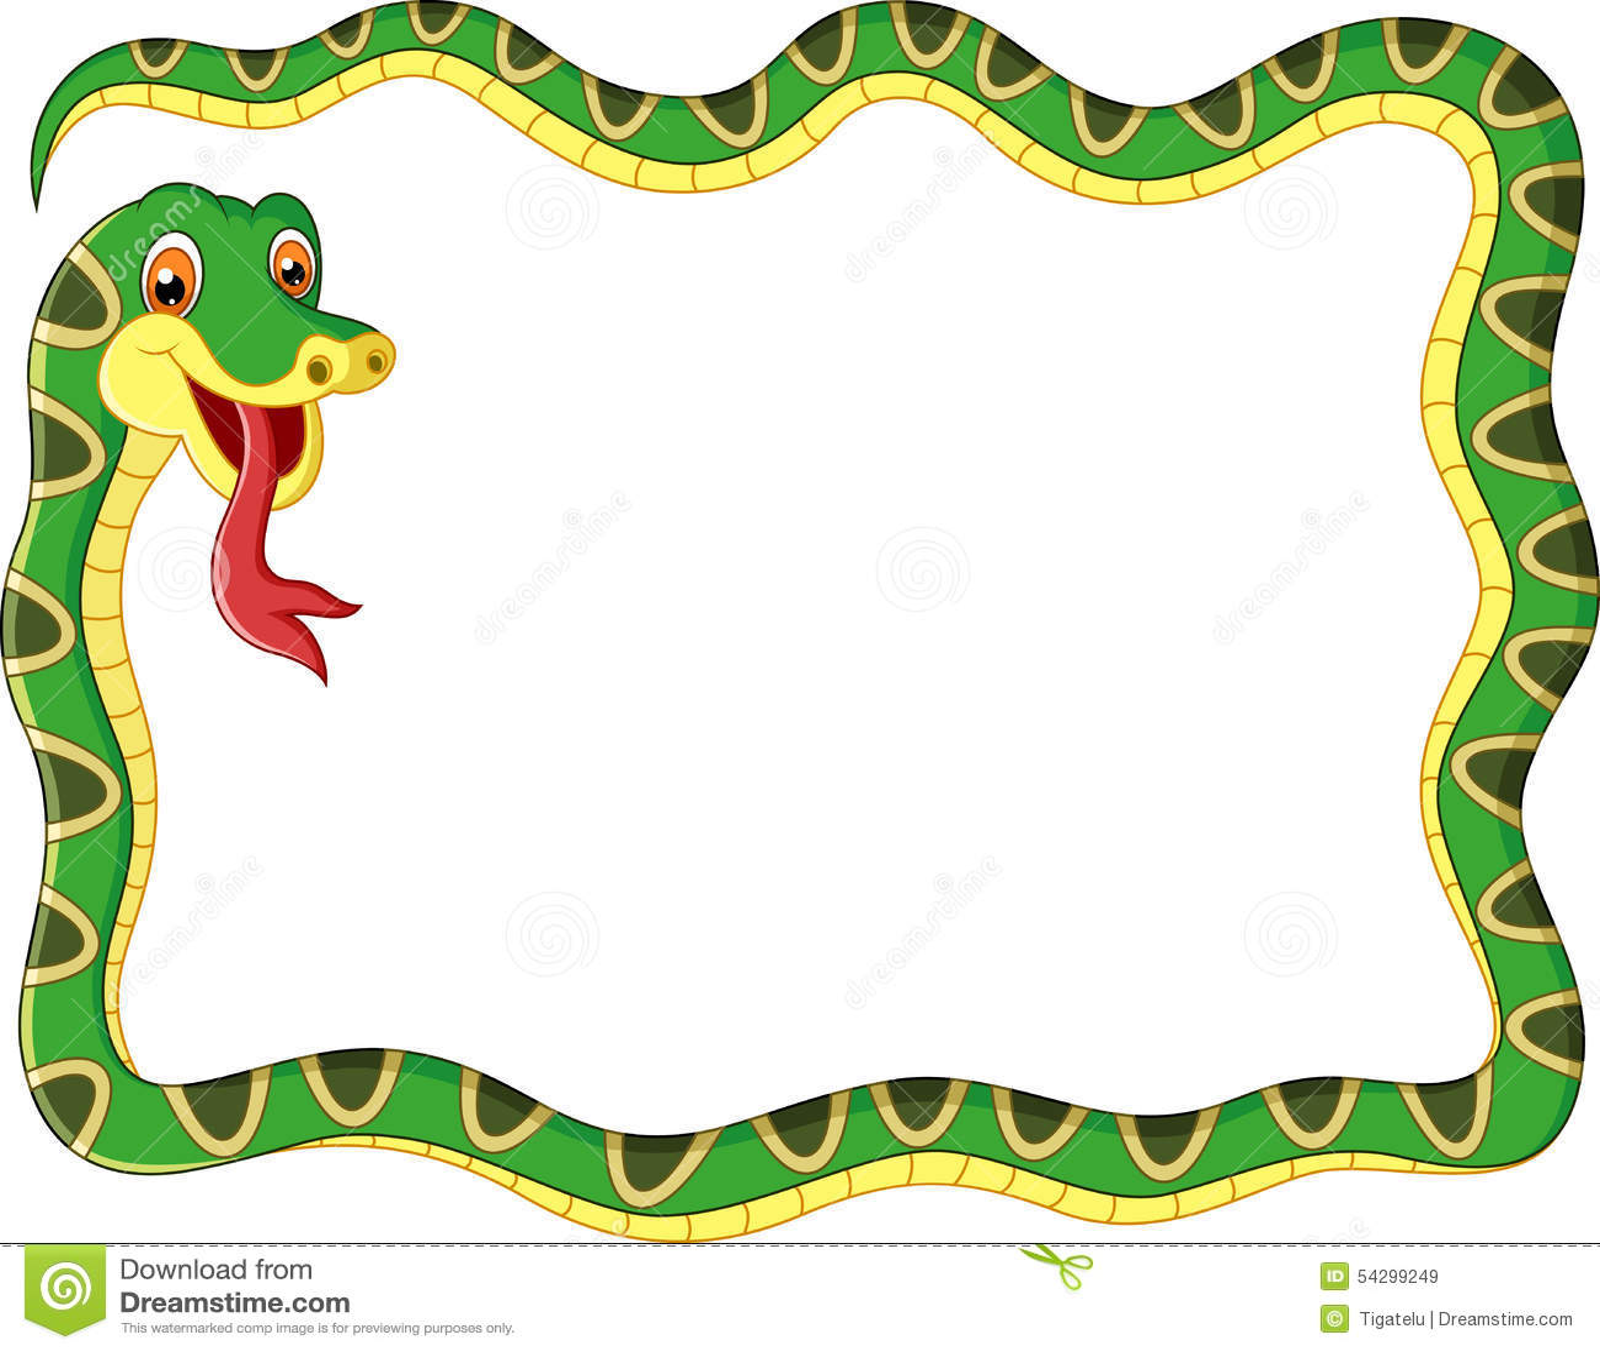 Cartoon Snake Frame Stock Illustration - Image: 54299249